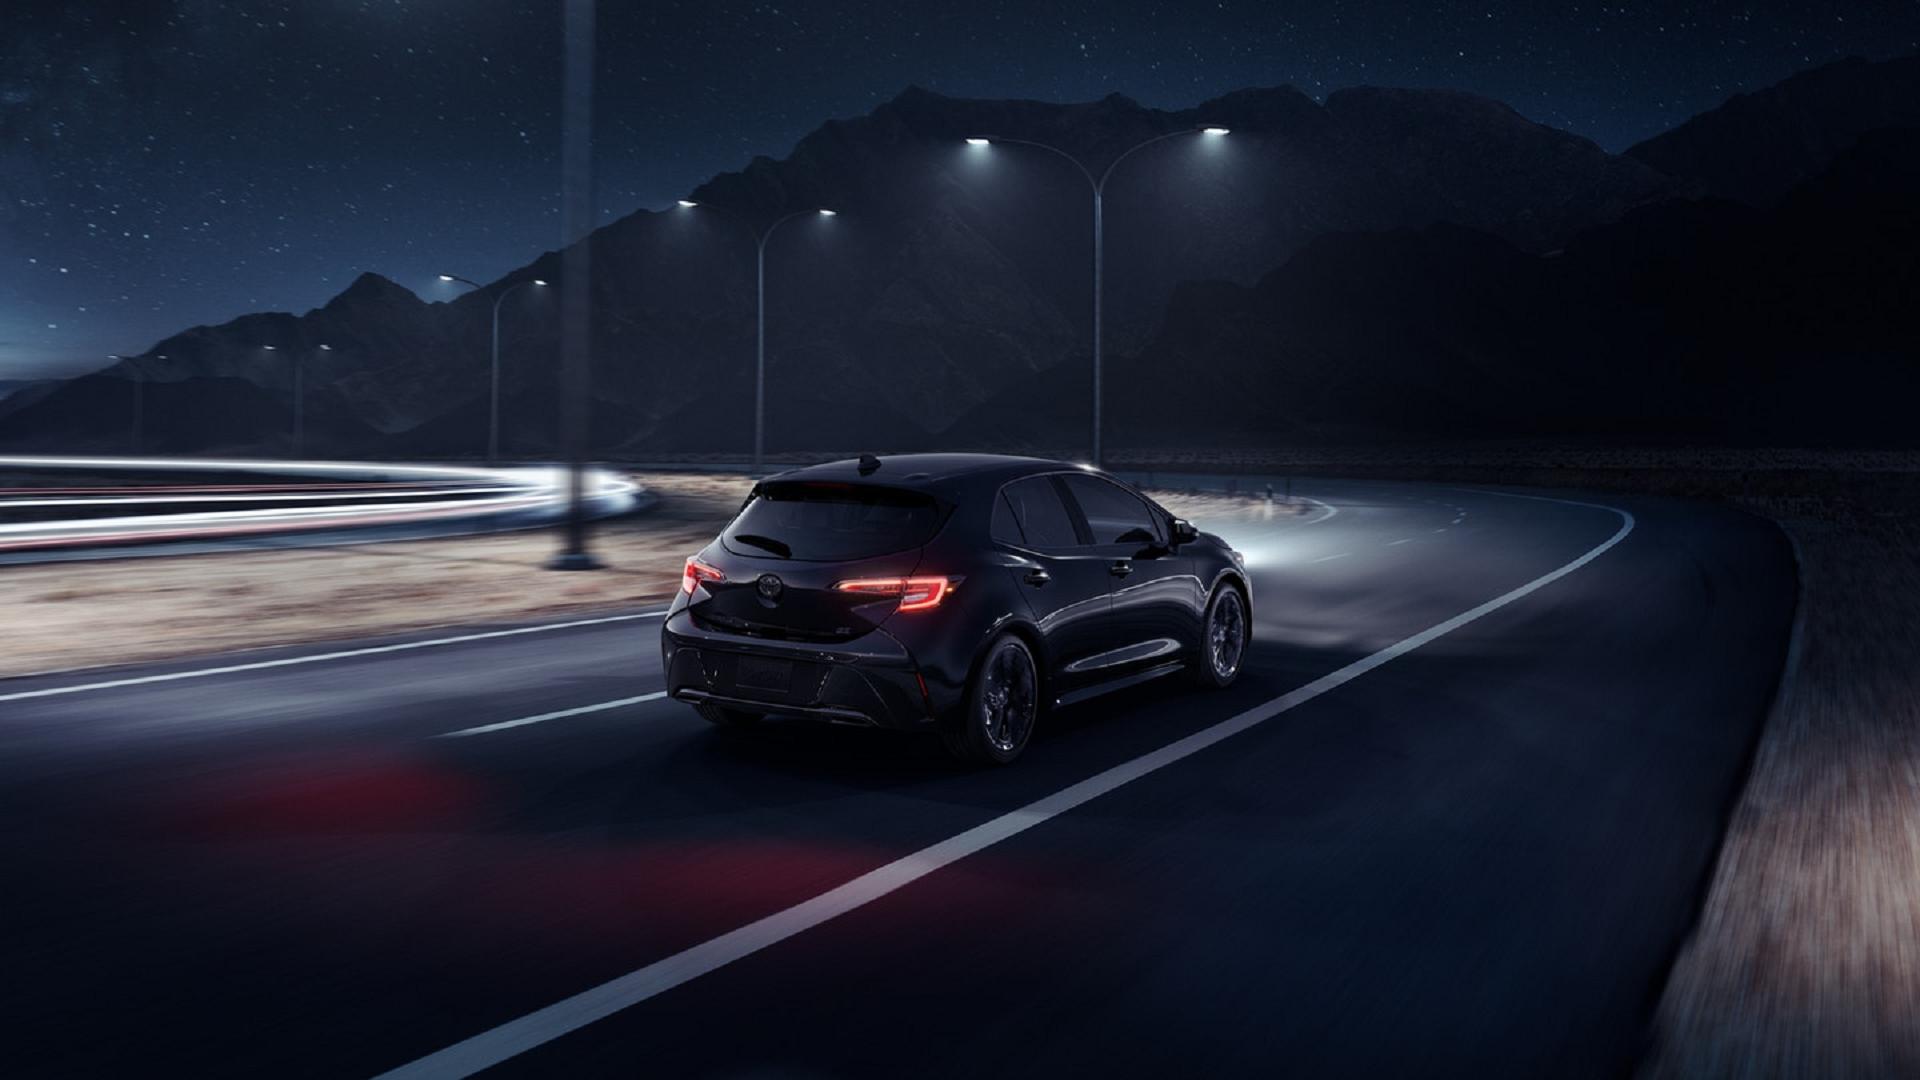 Toyota_Corolla_Hatchback_Driving_At_Night